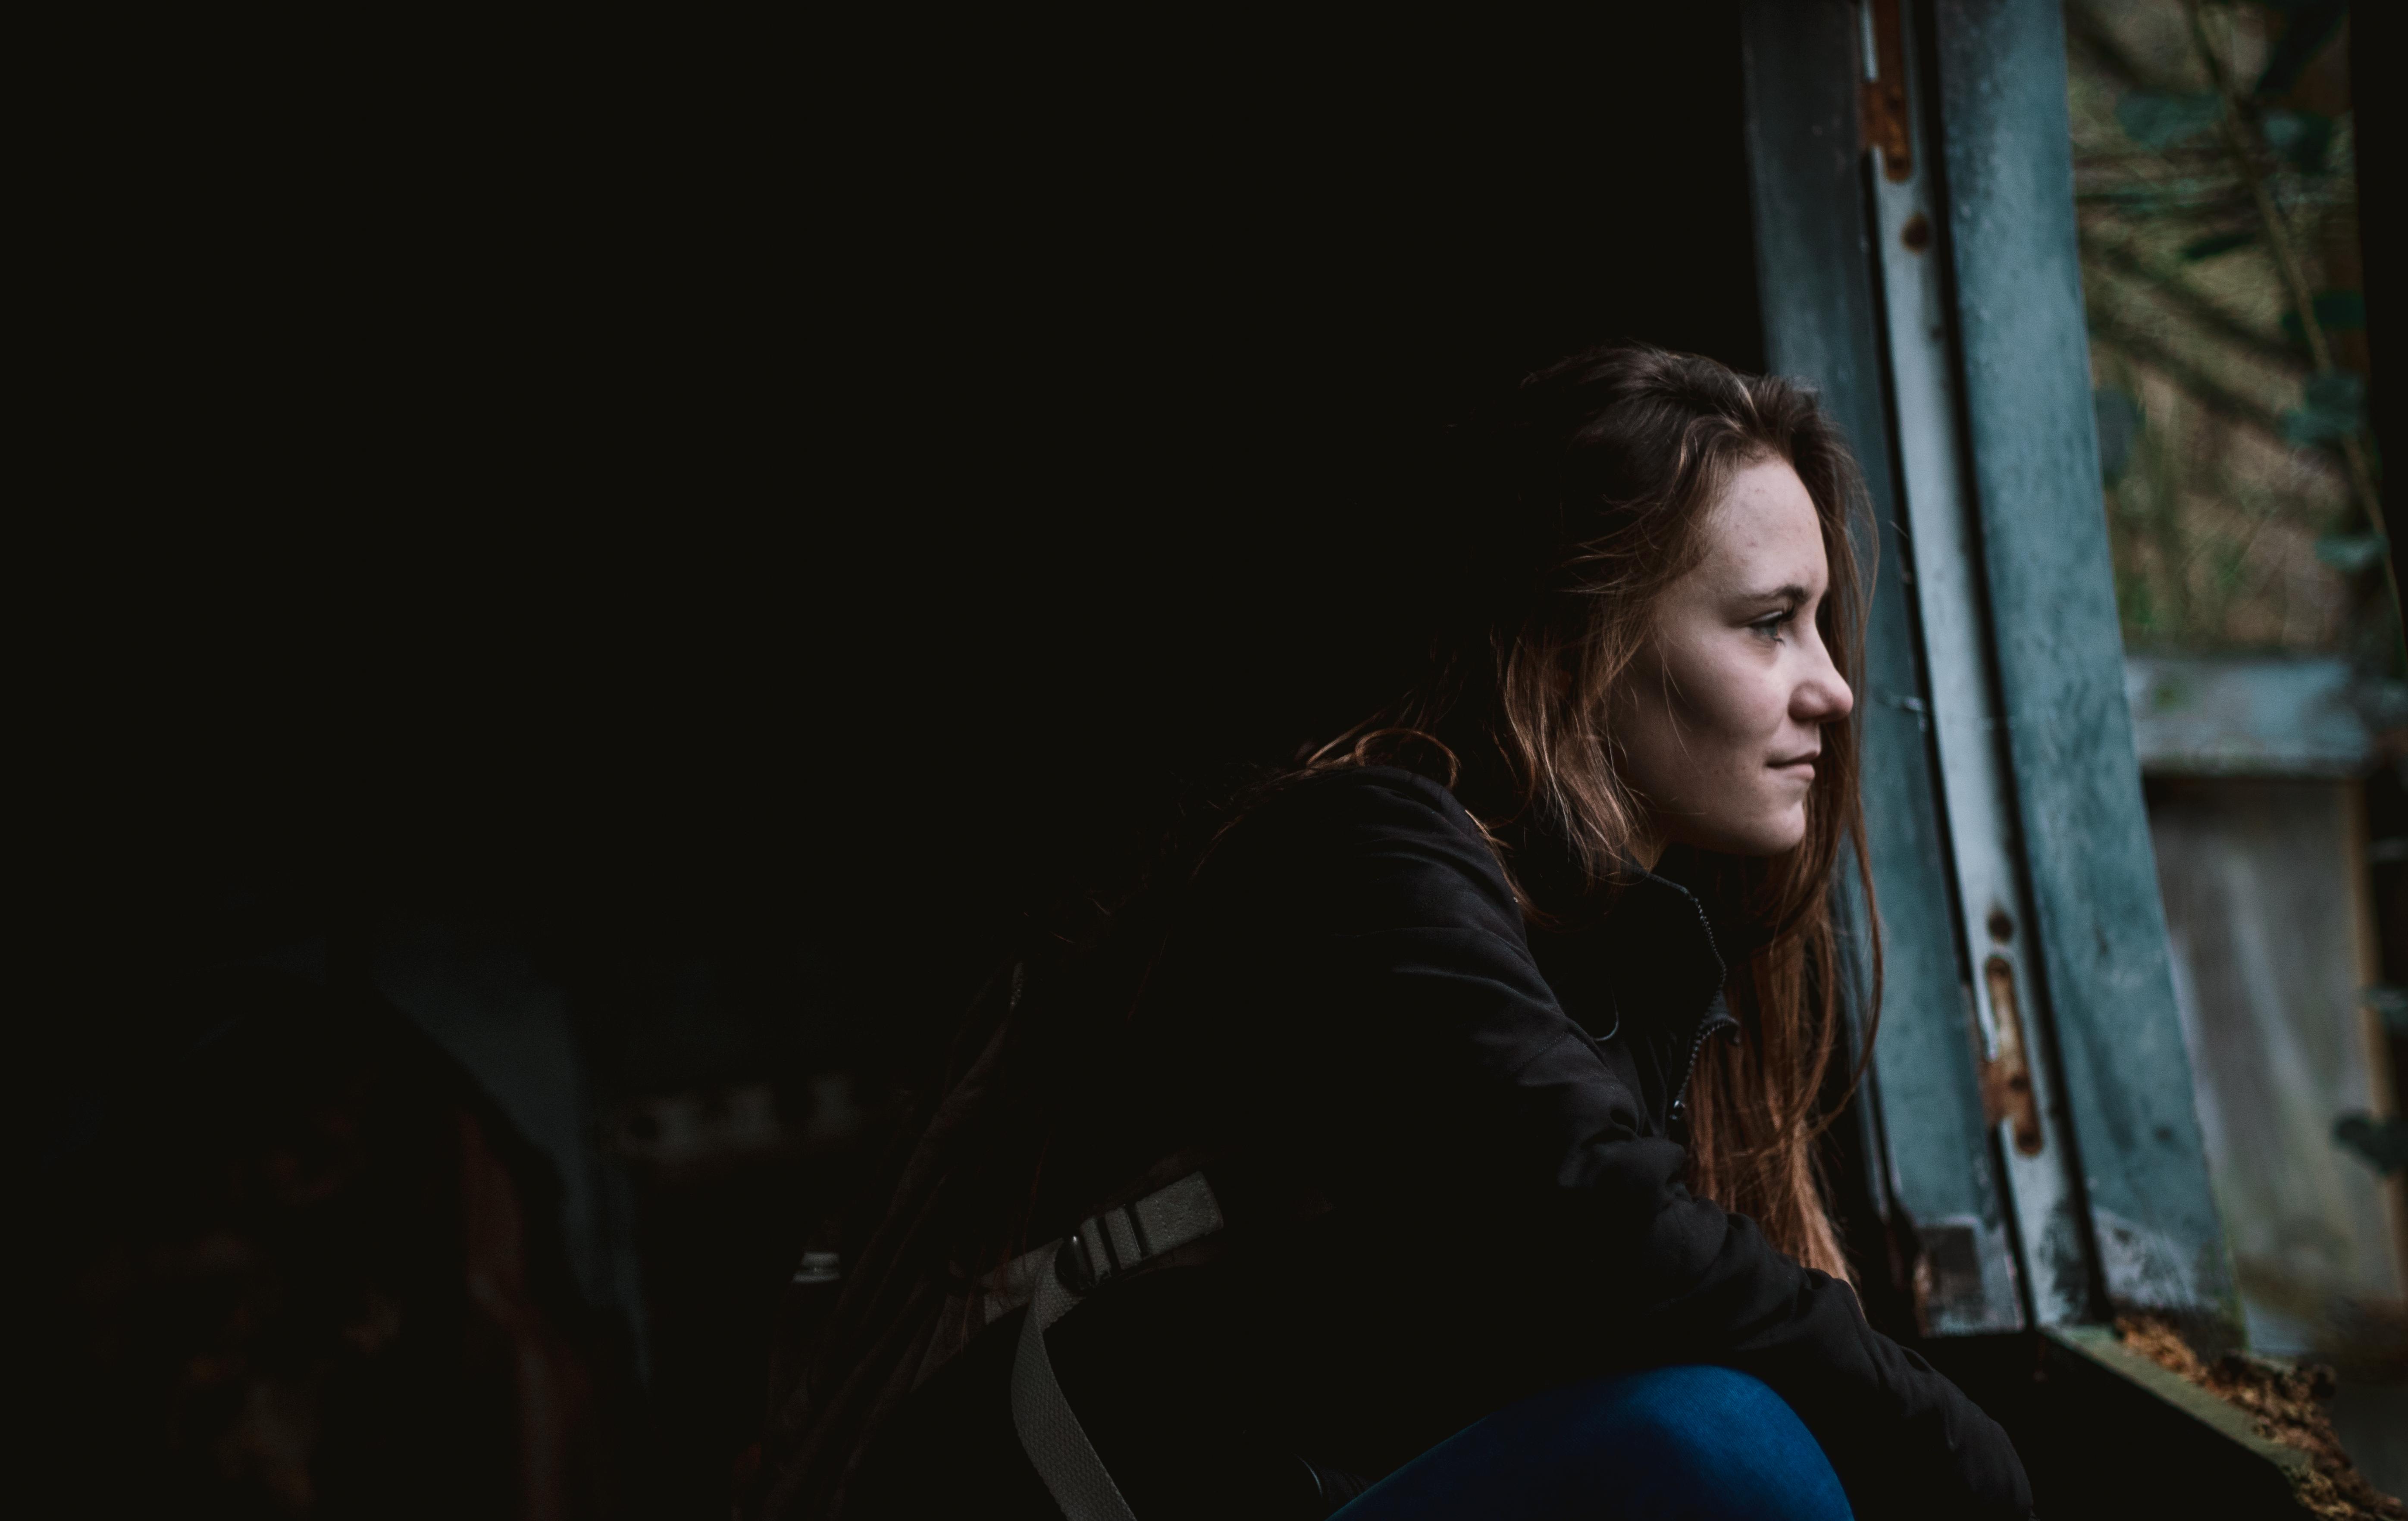 woman sitting next to window